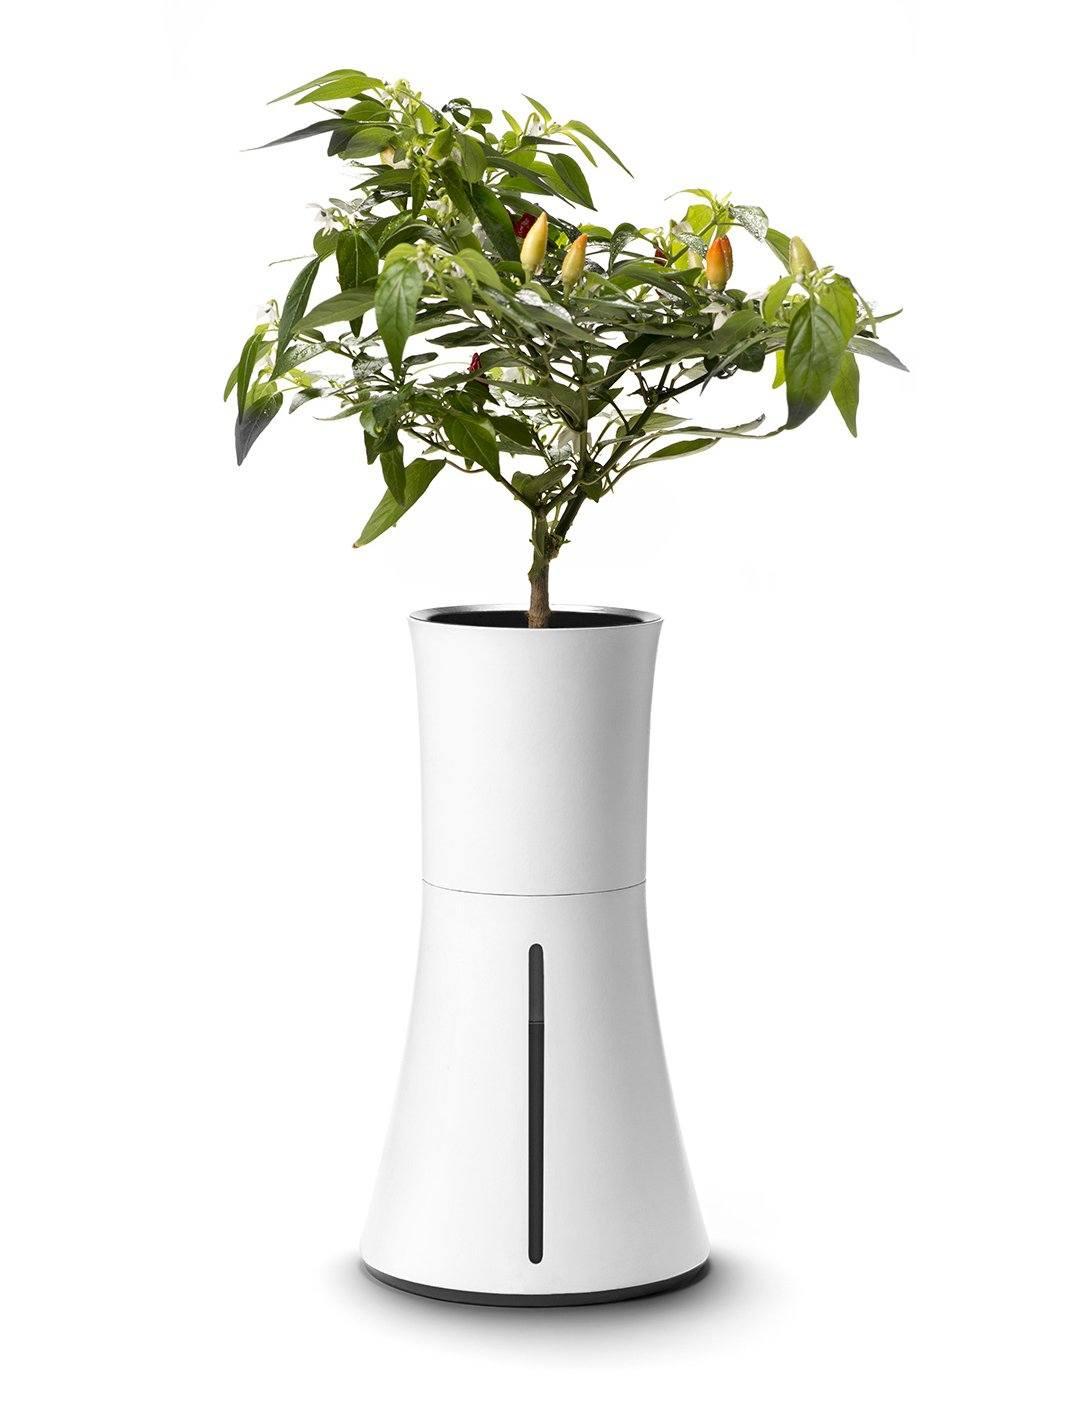 Jardinera inteligente/Foto: Botanium